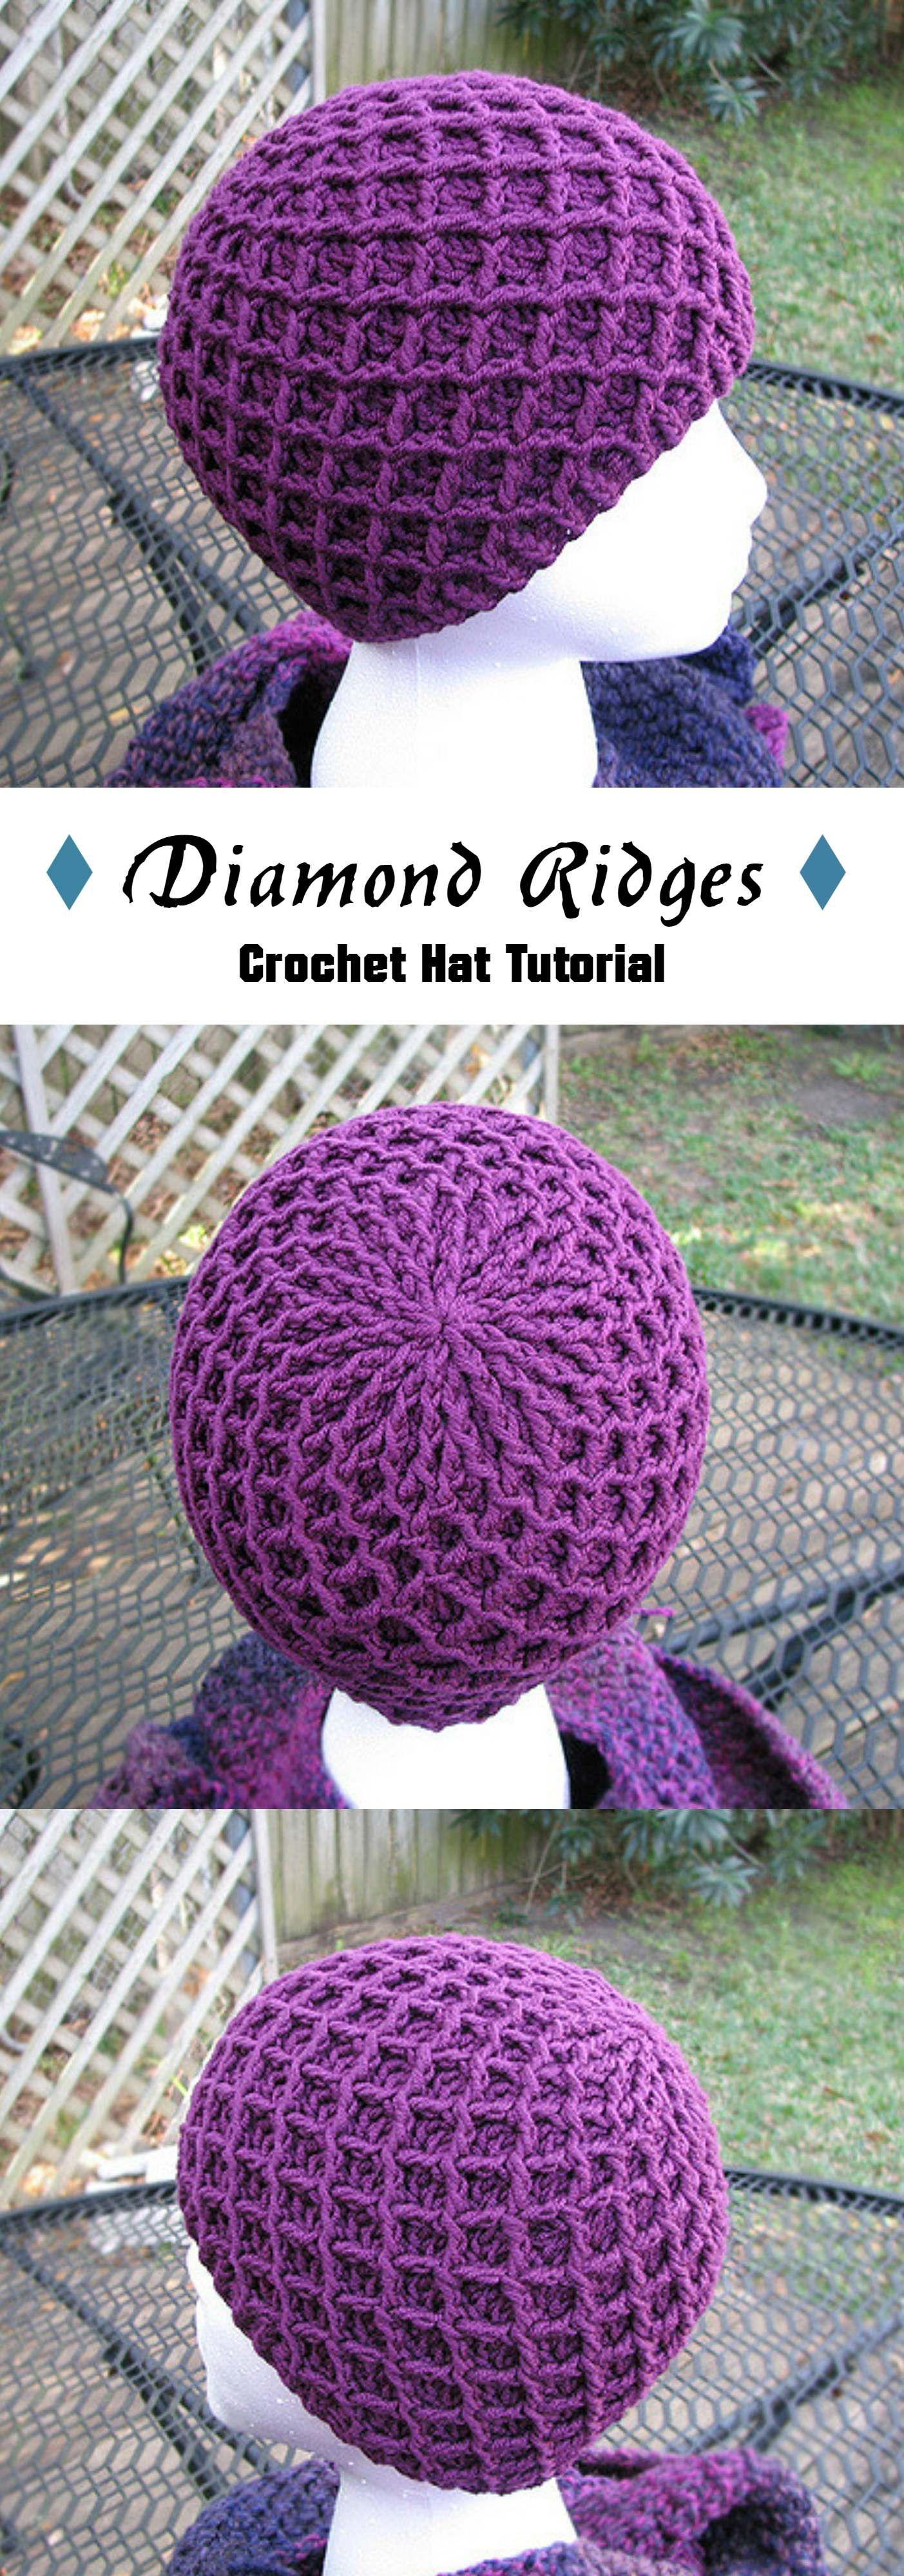 Crochet Diamond Ridges Hat   Gorros, Tejido y Ganchillo